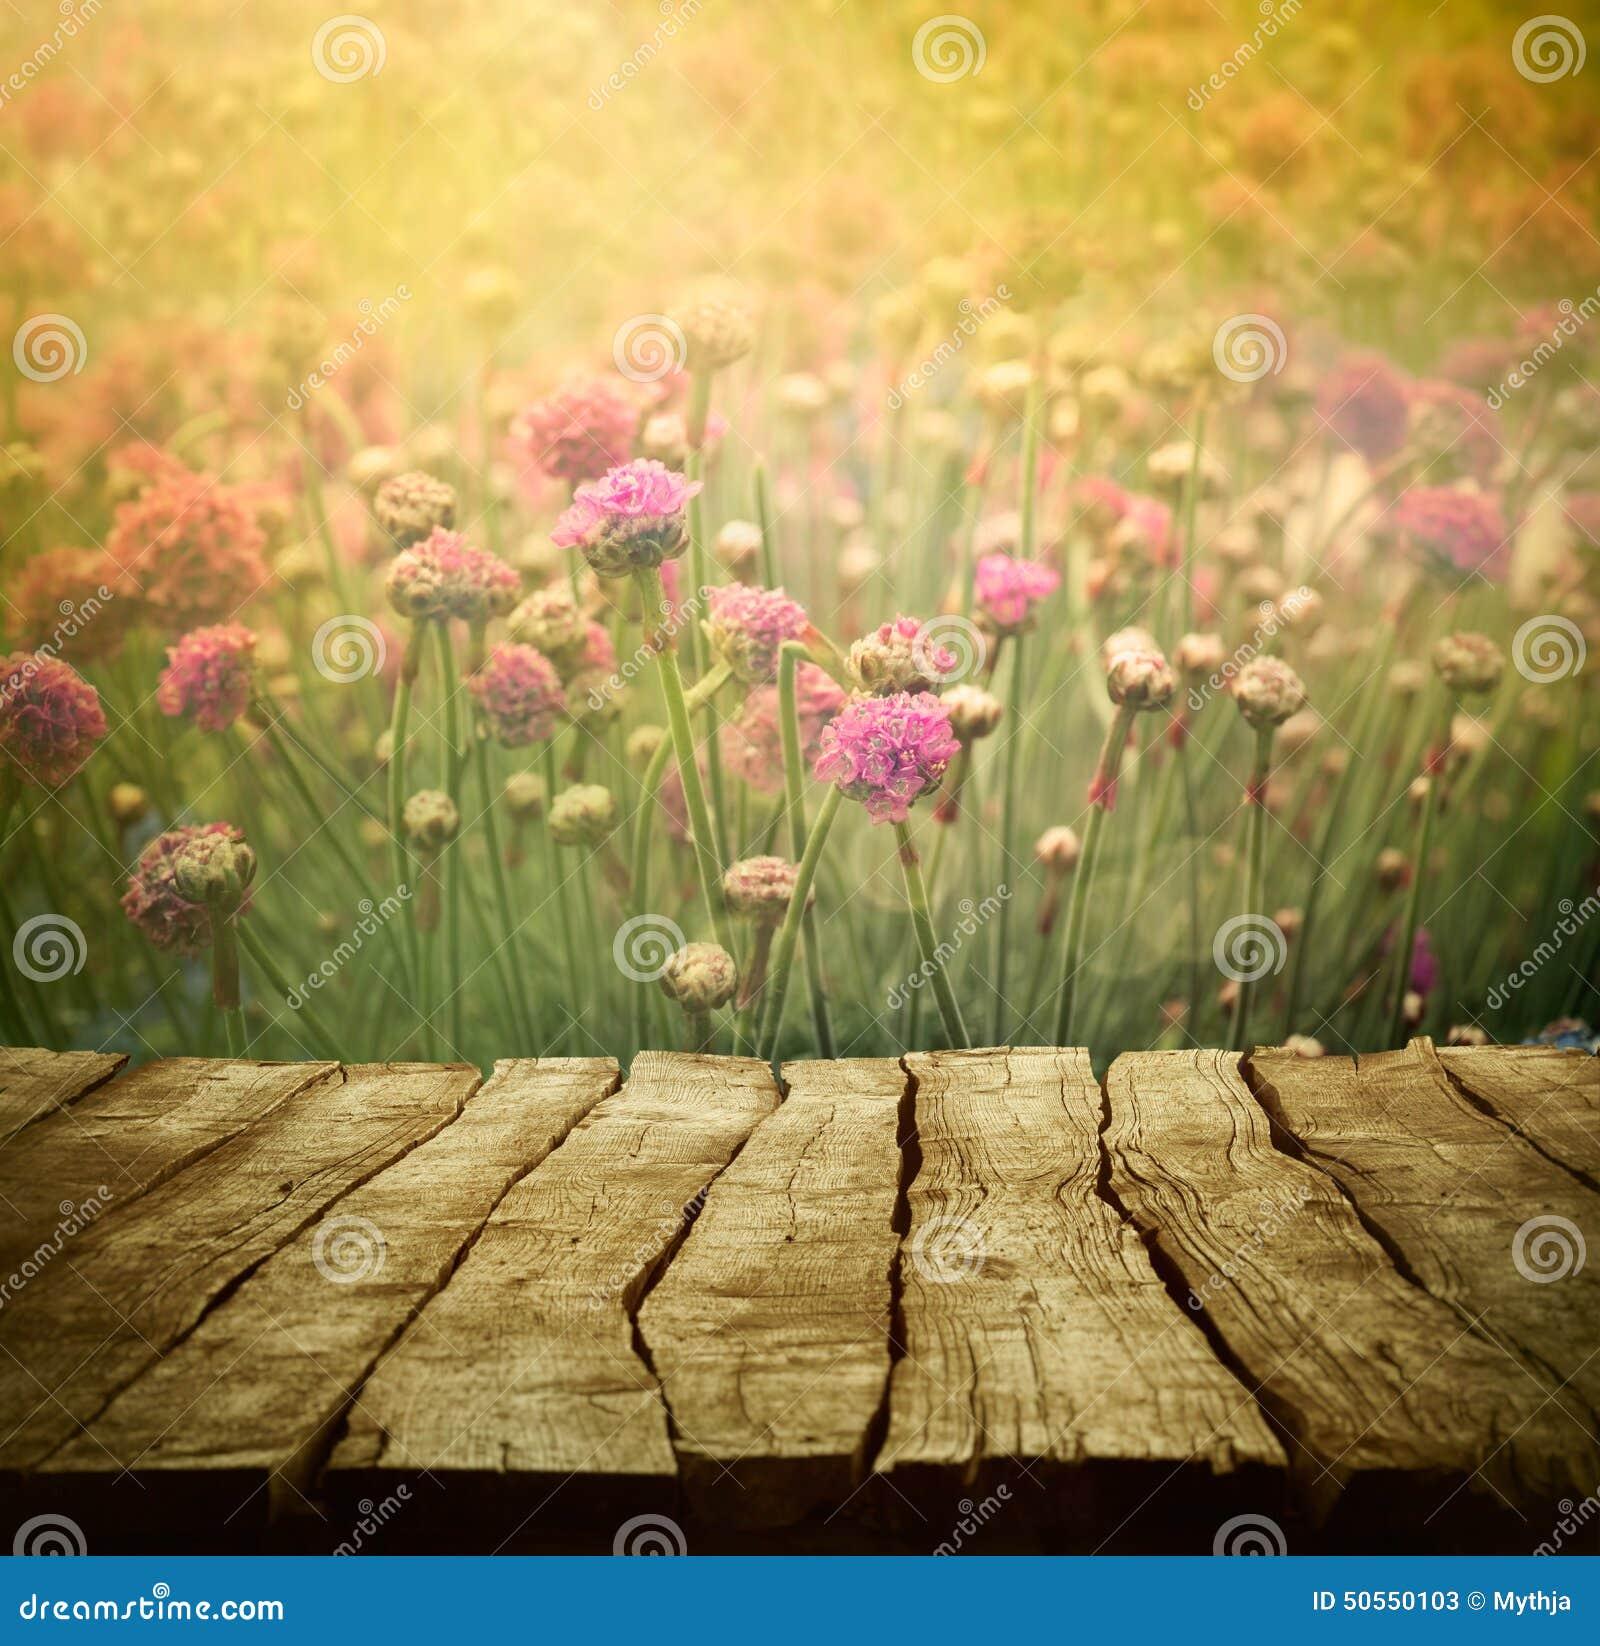 Flower Background Stock Image Image Of Garden Floral 50550103